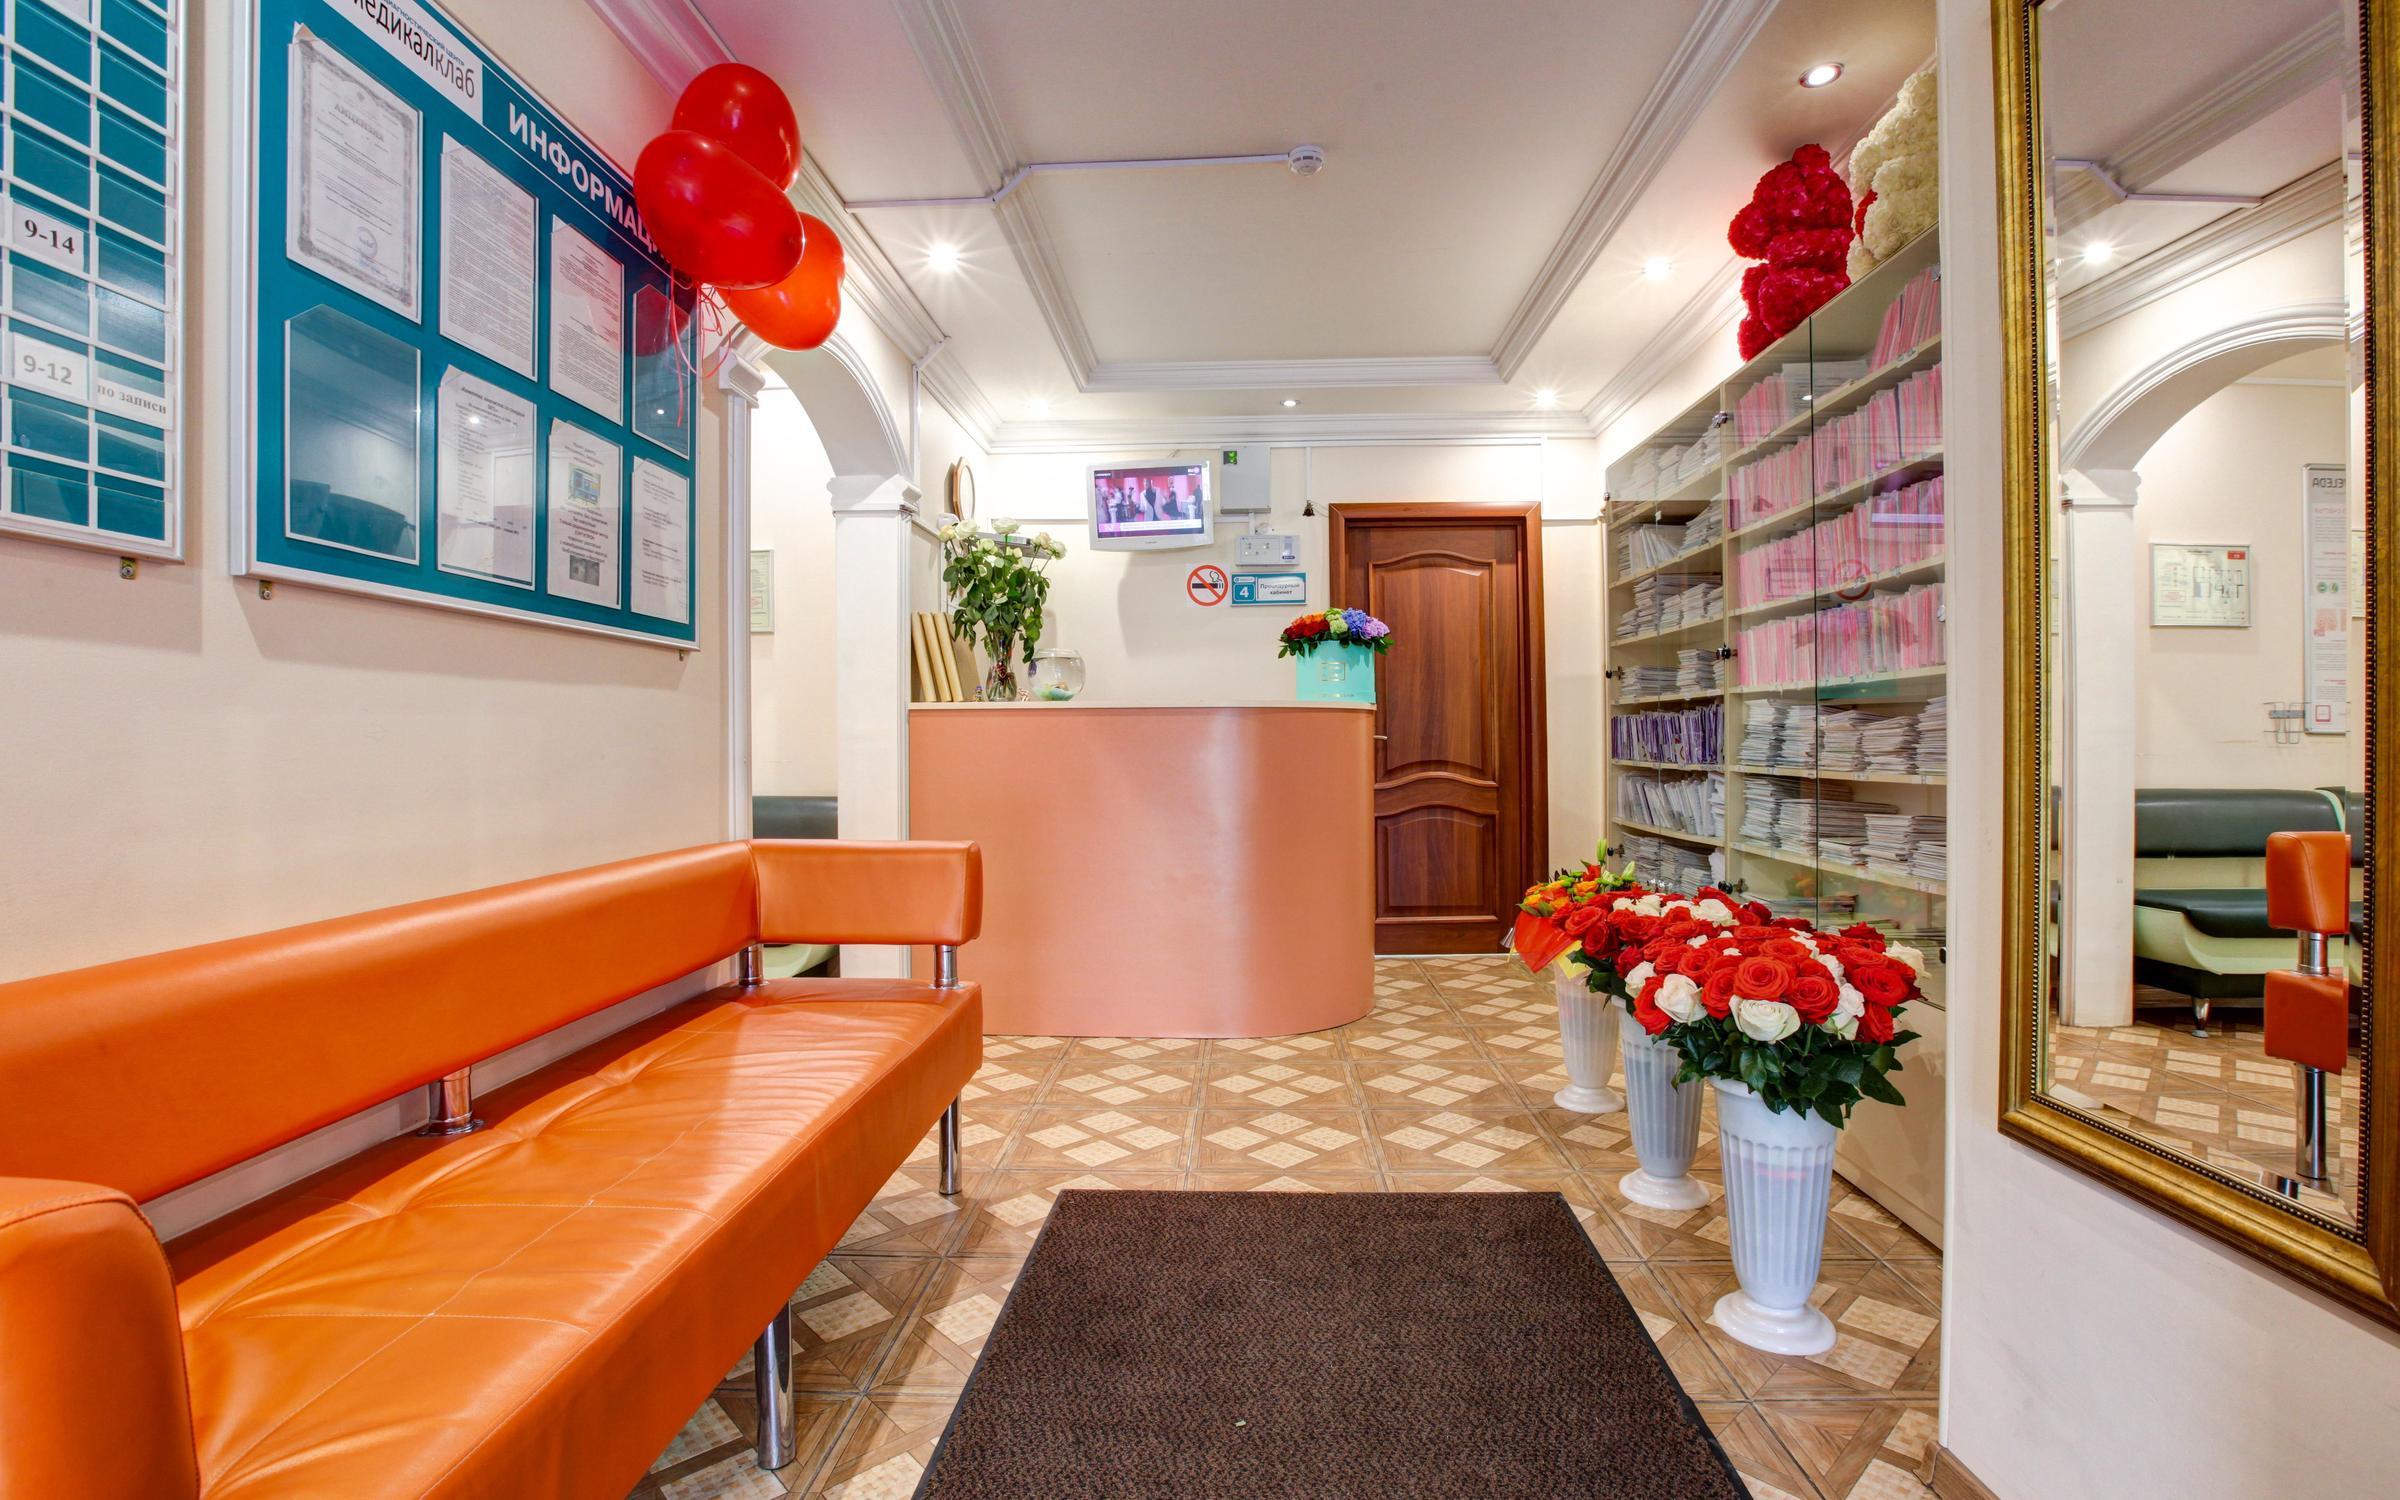 фотография Клиники МедикалКлаб на улице Генерала Кузнецова, 13